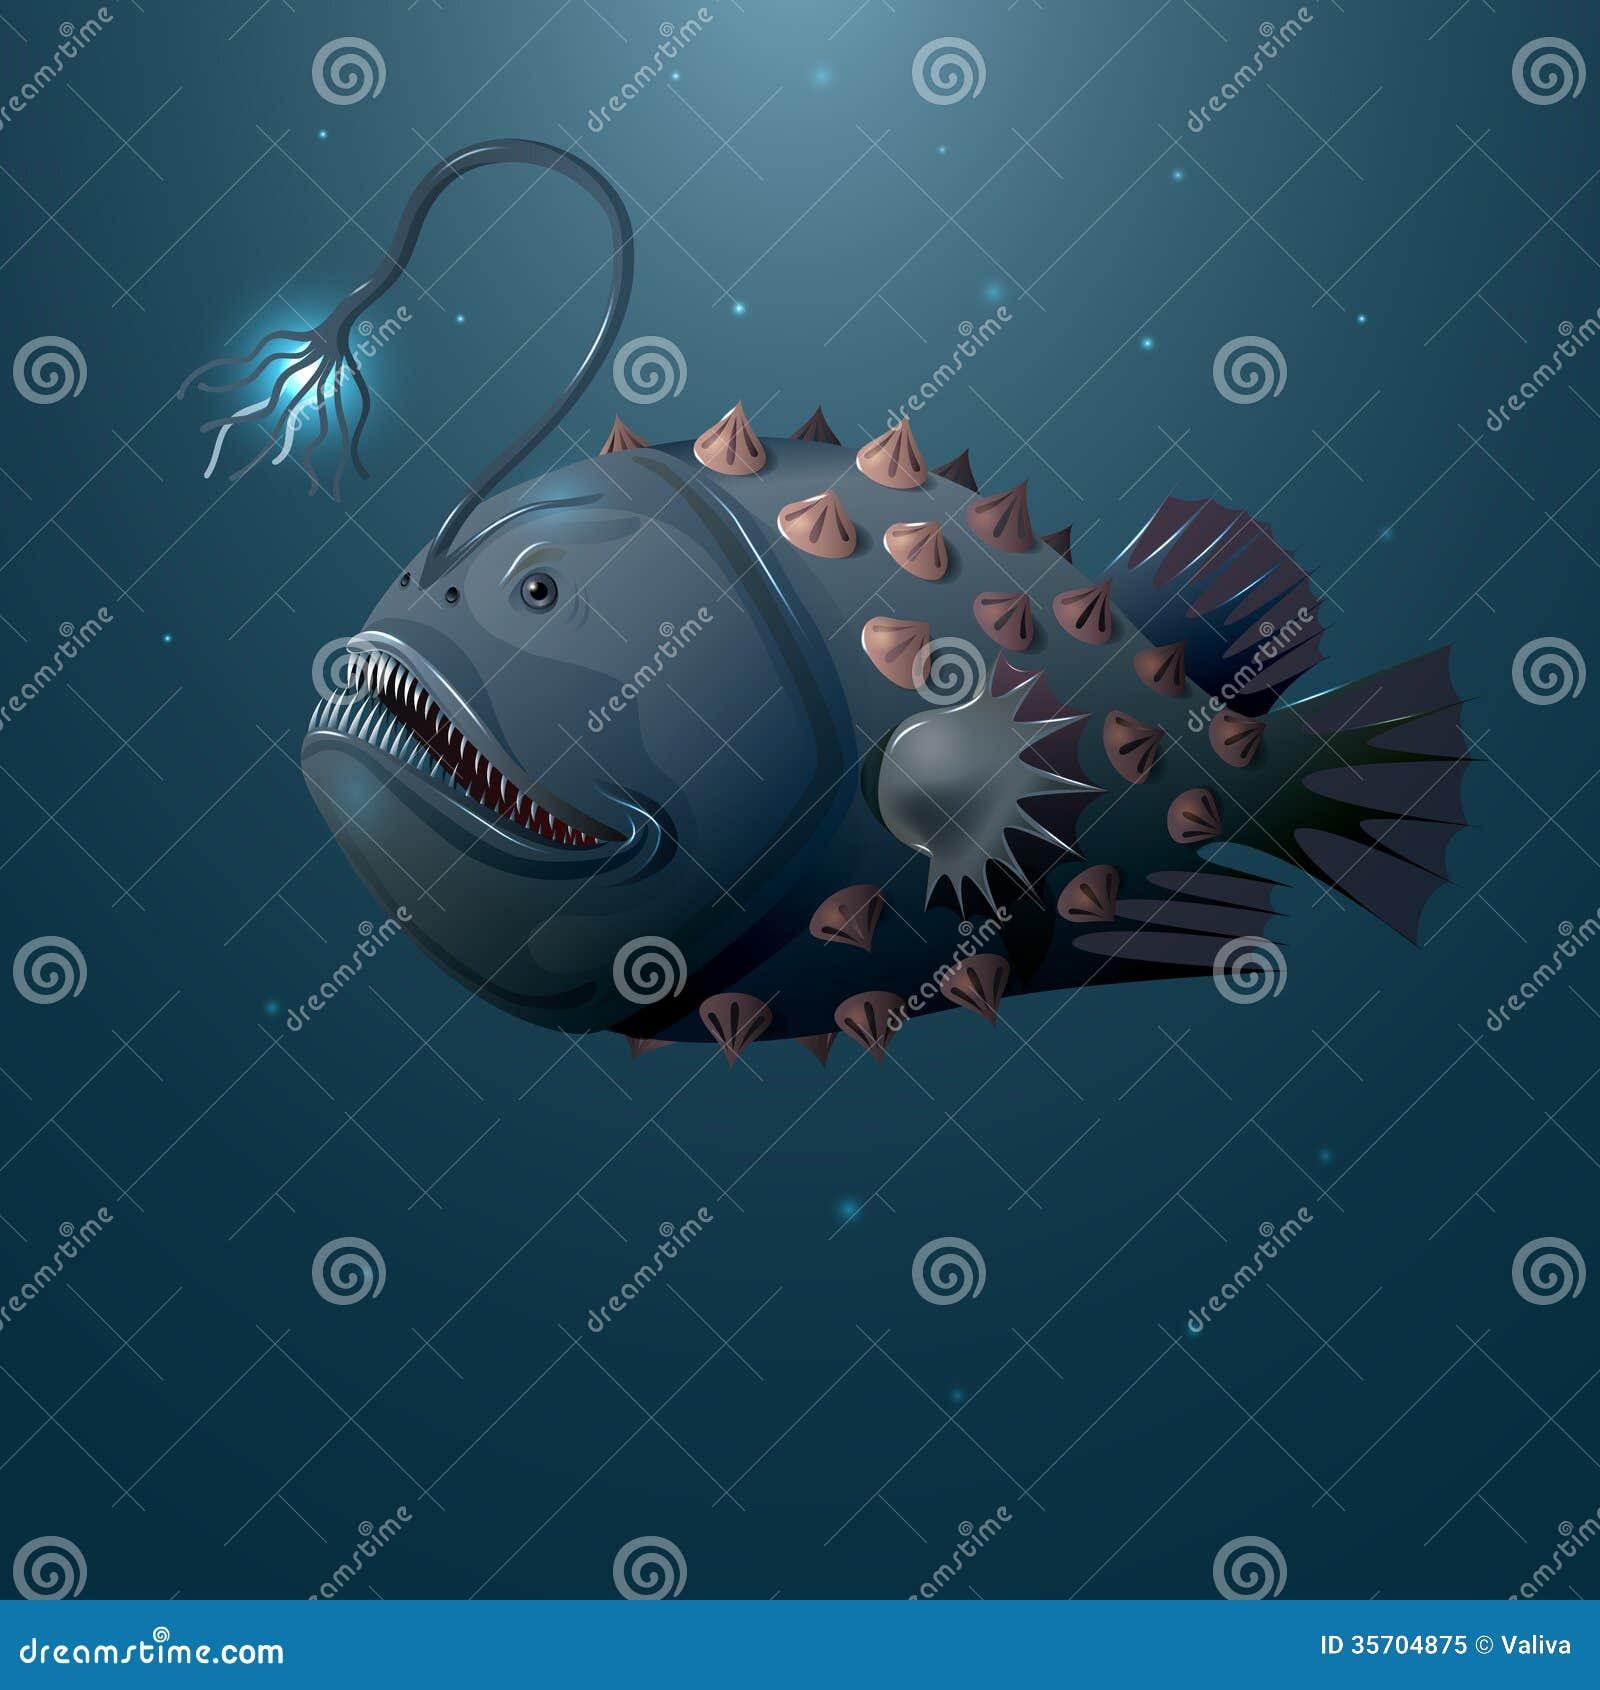 Angler fish stock vector image of flash dark aquatic for Deep water fish